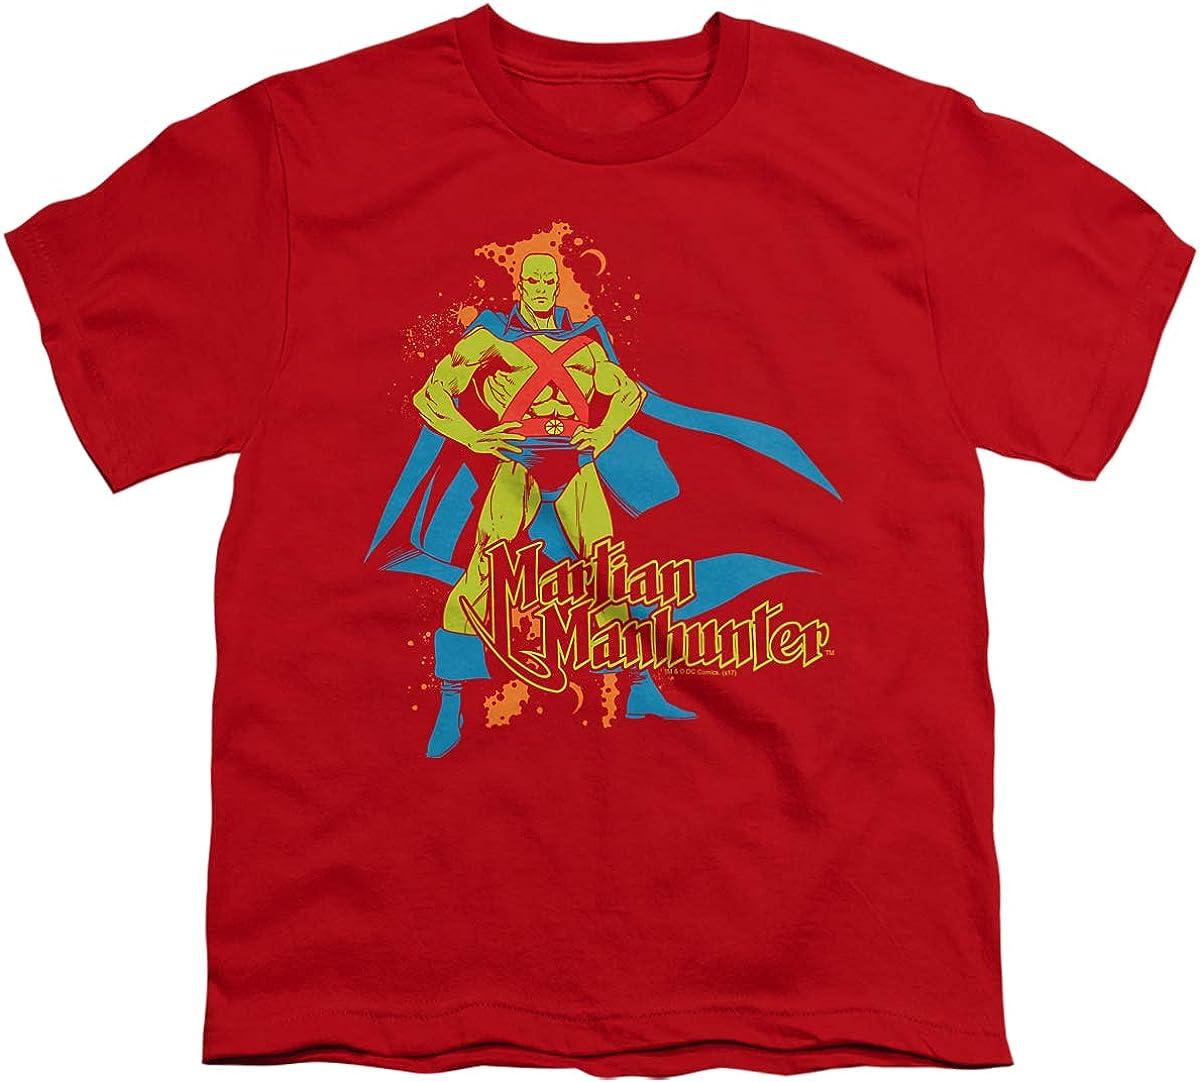 DC Martian Manhunter Unisex Youth T Shirt, Red, X-Large